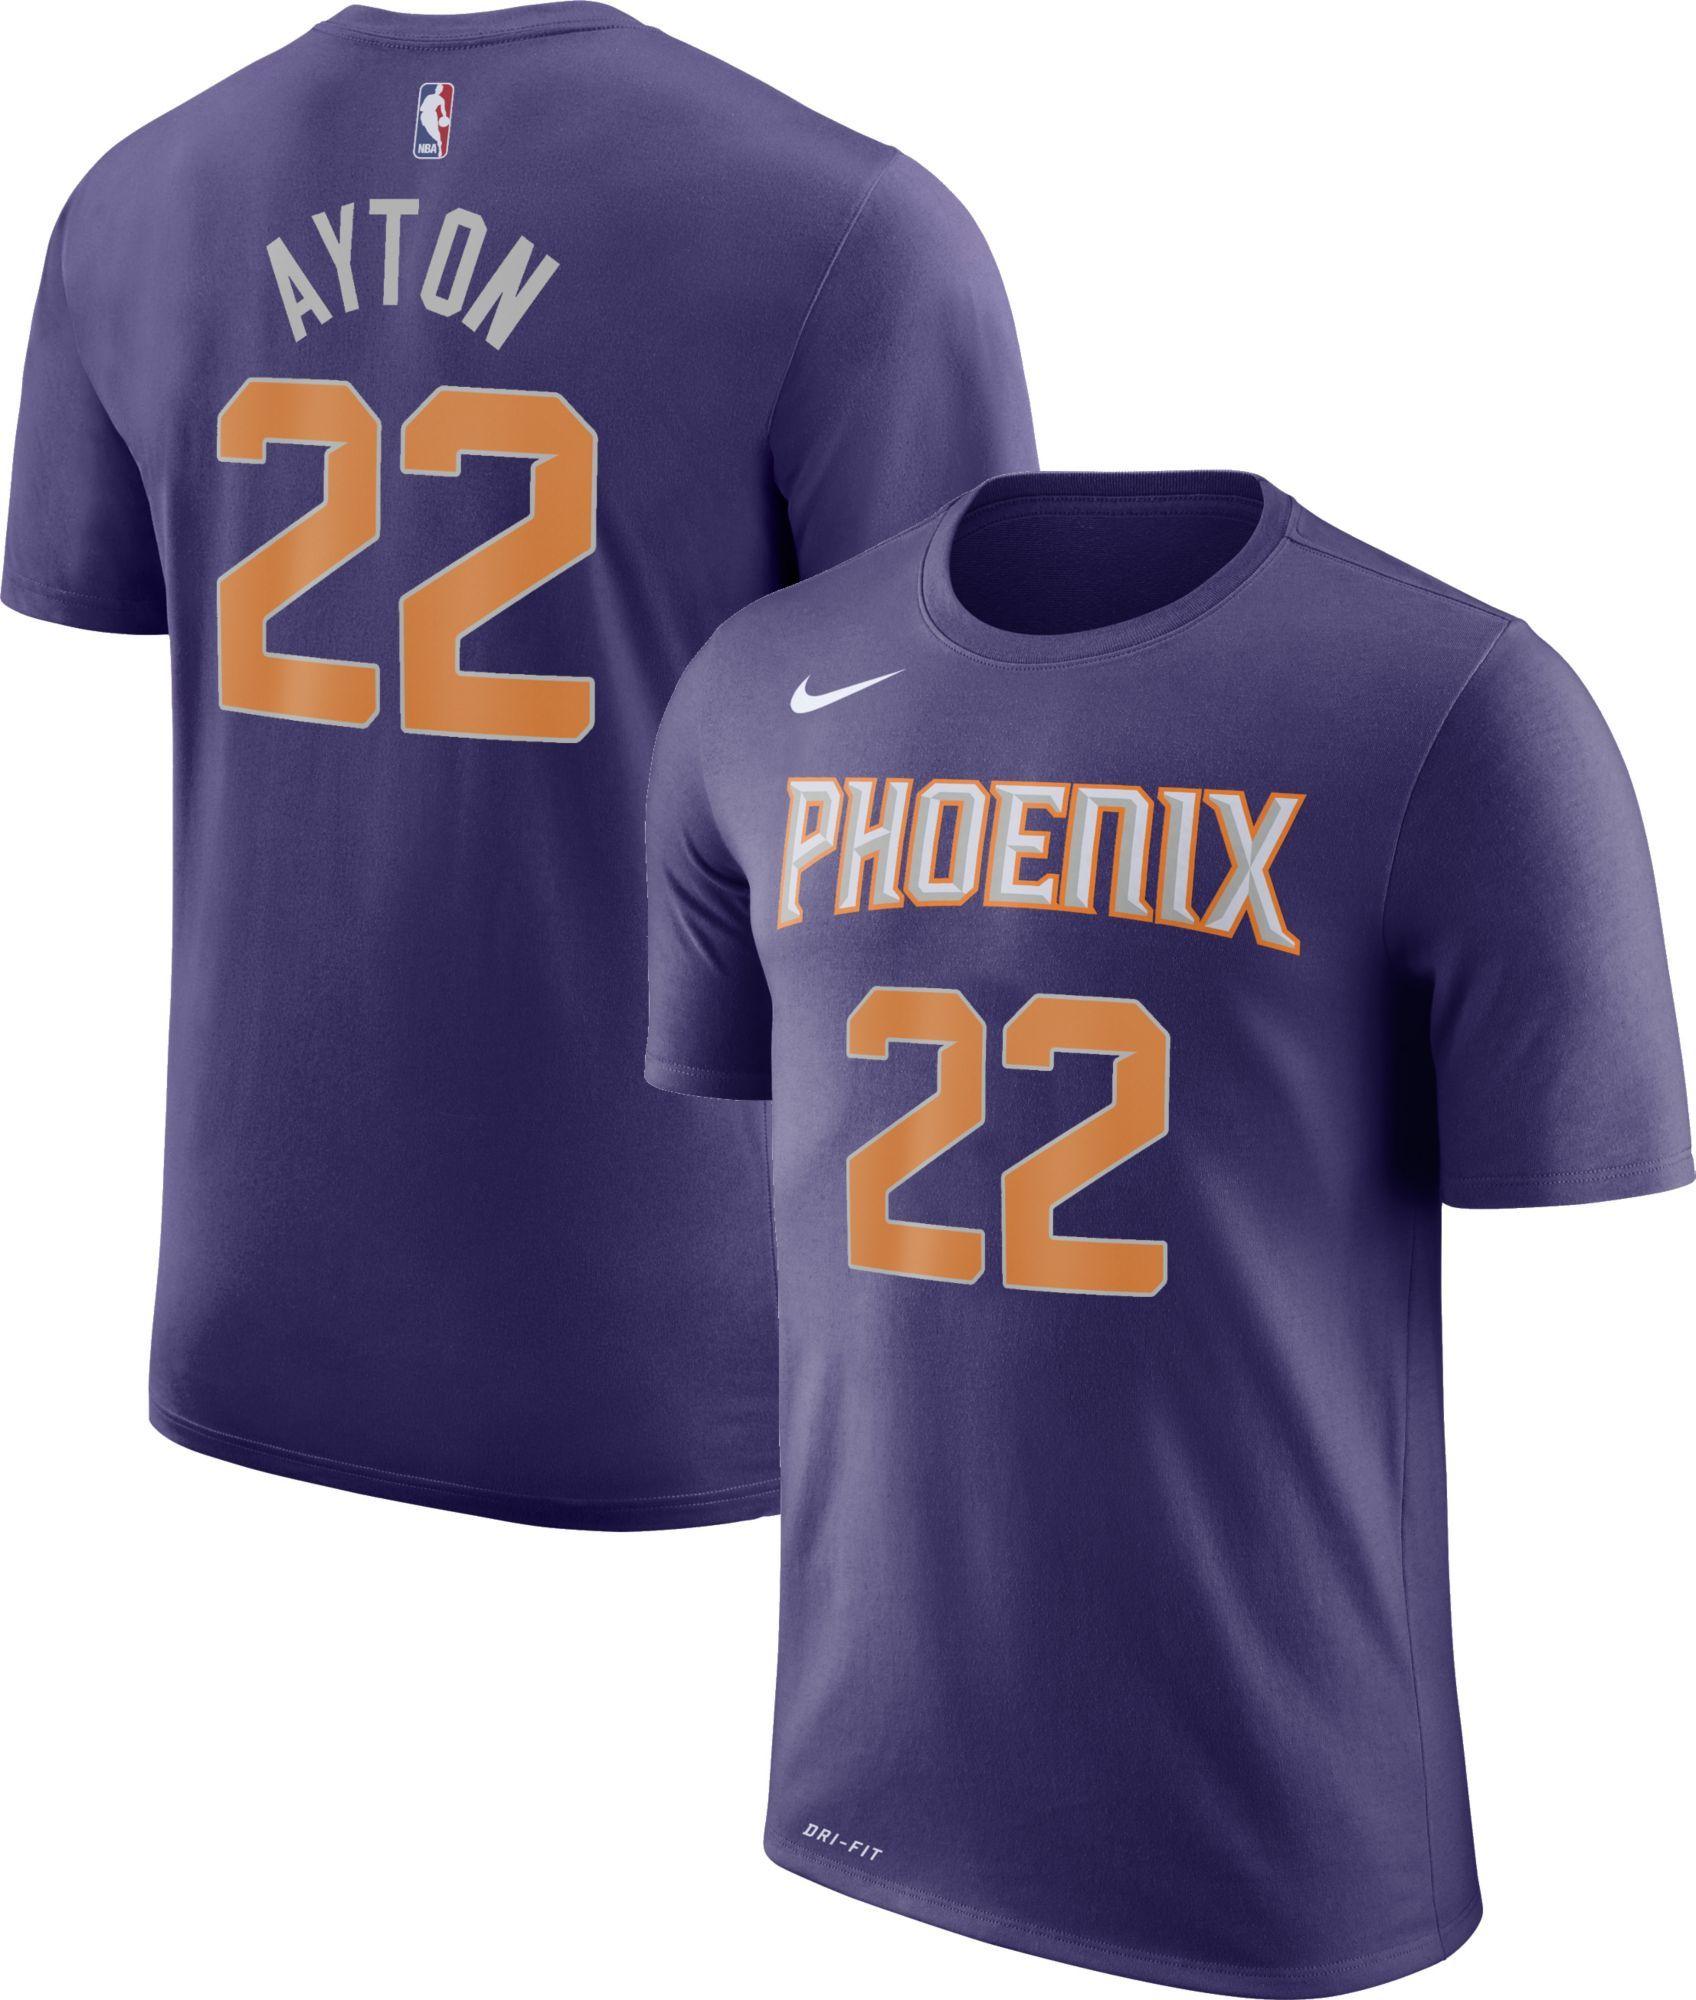 340cdba5d22 Nike Youth Phoenix Suns DeAndre Ayton  22 Dri-FIT Purple T-Shirt ...